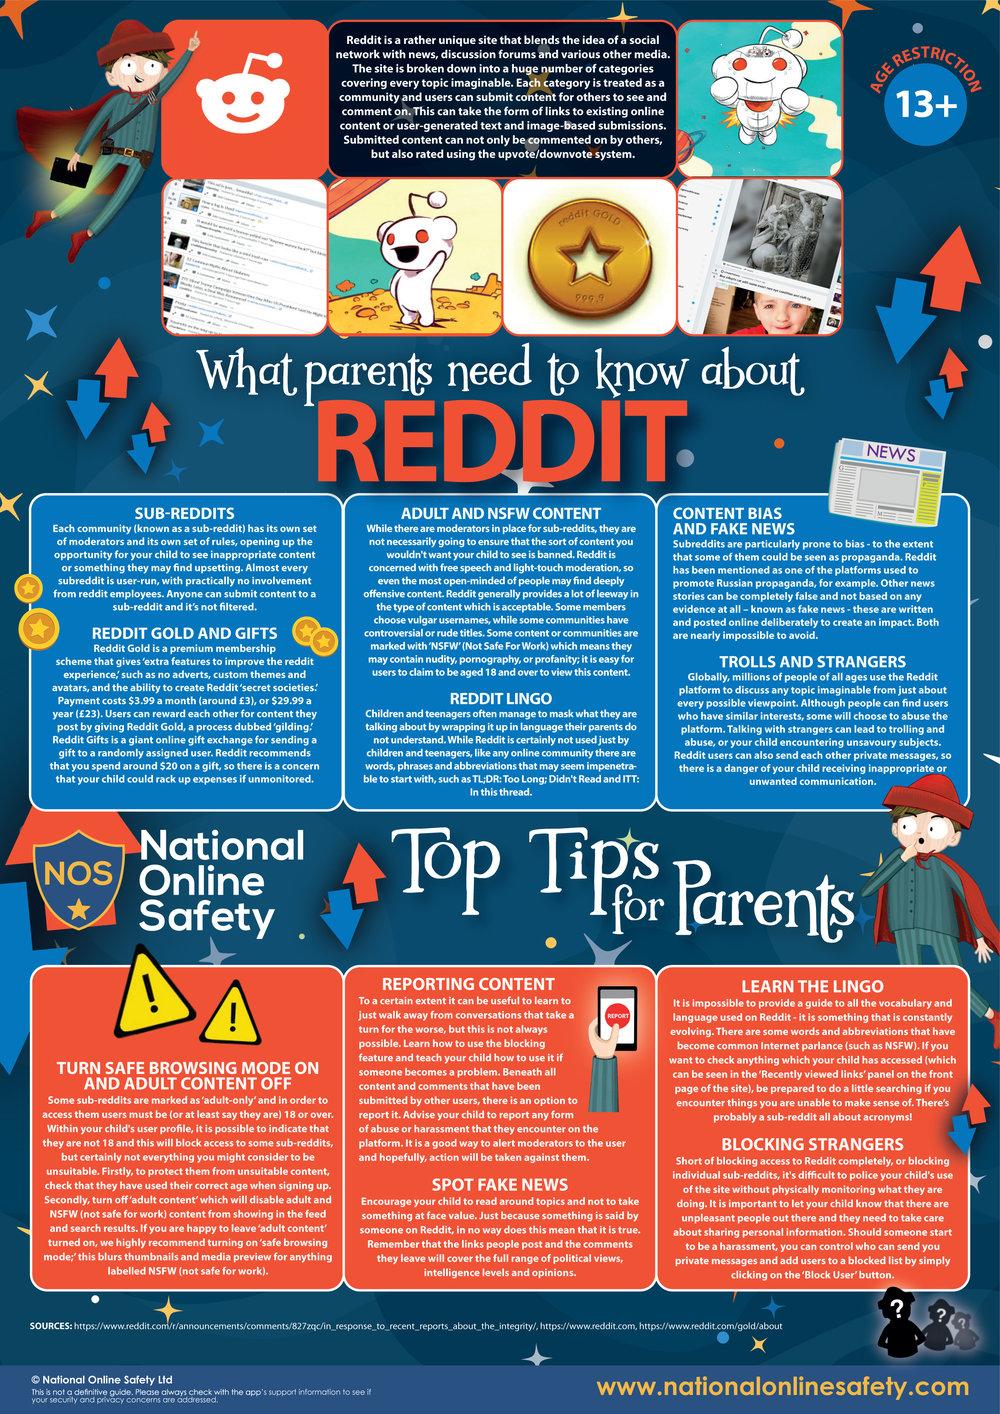 Reddit-Parents-Guide-September-2018.jpg